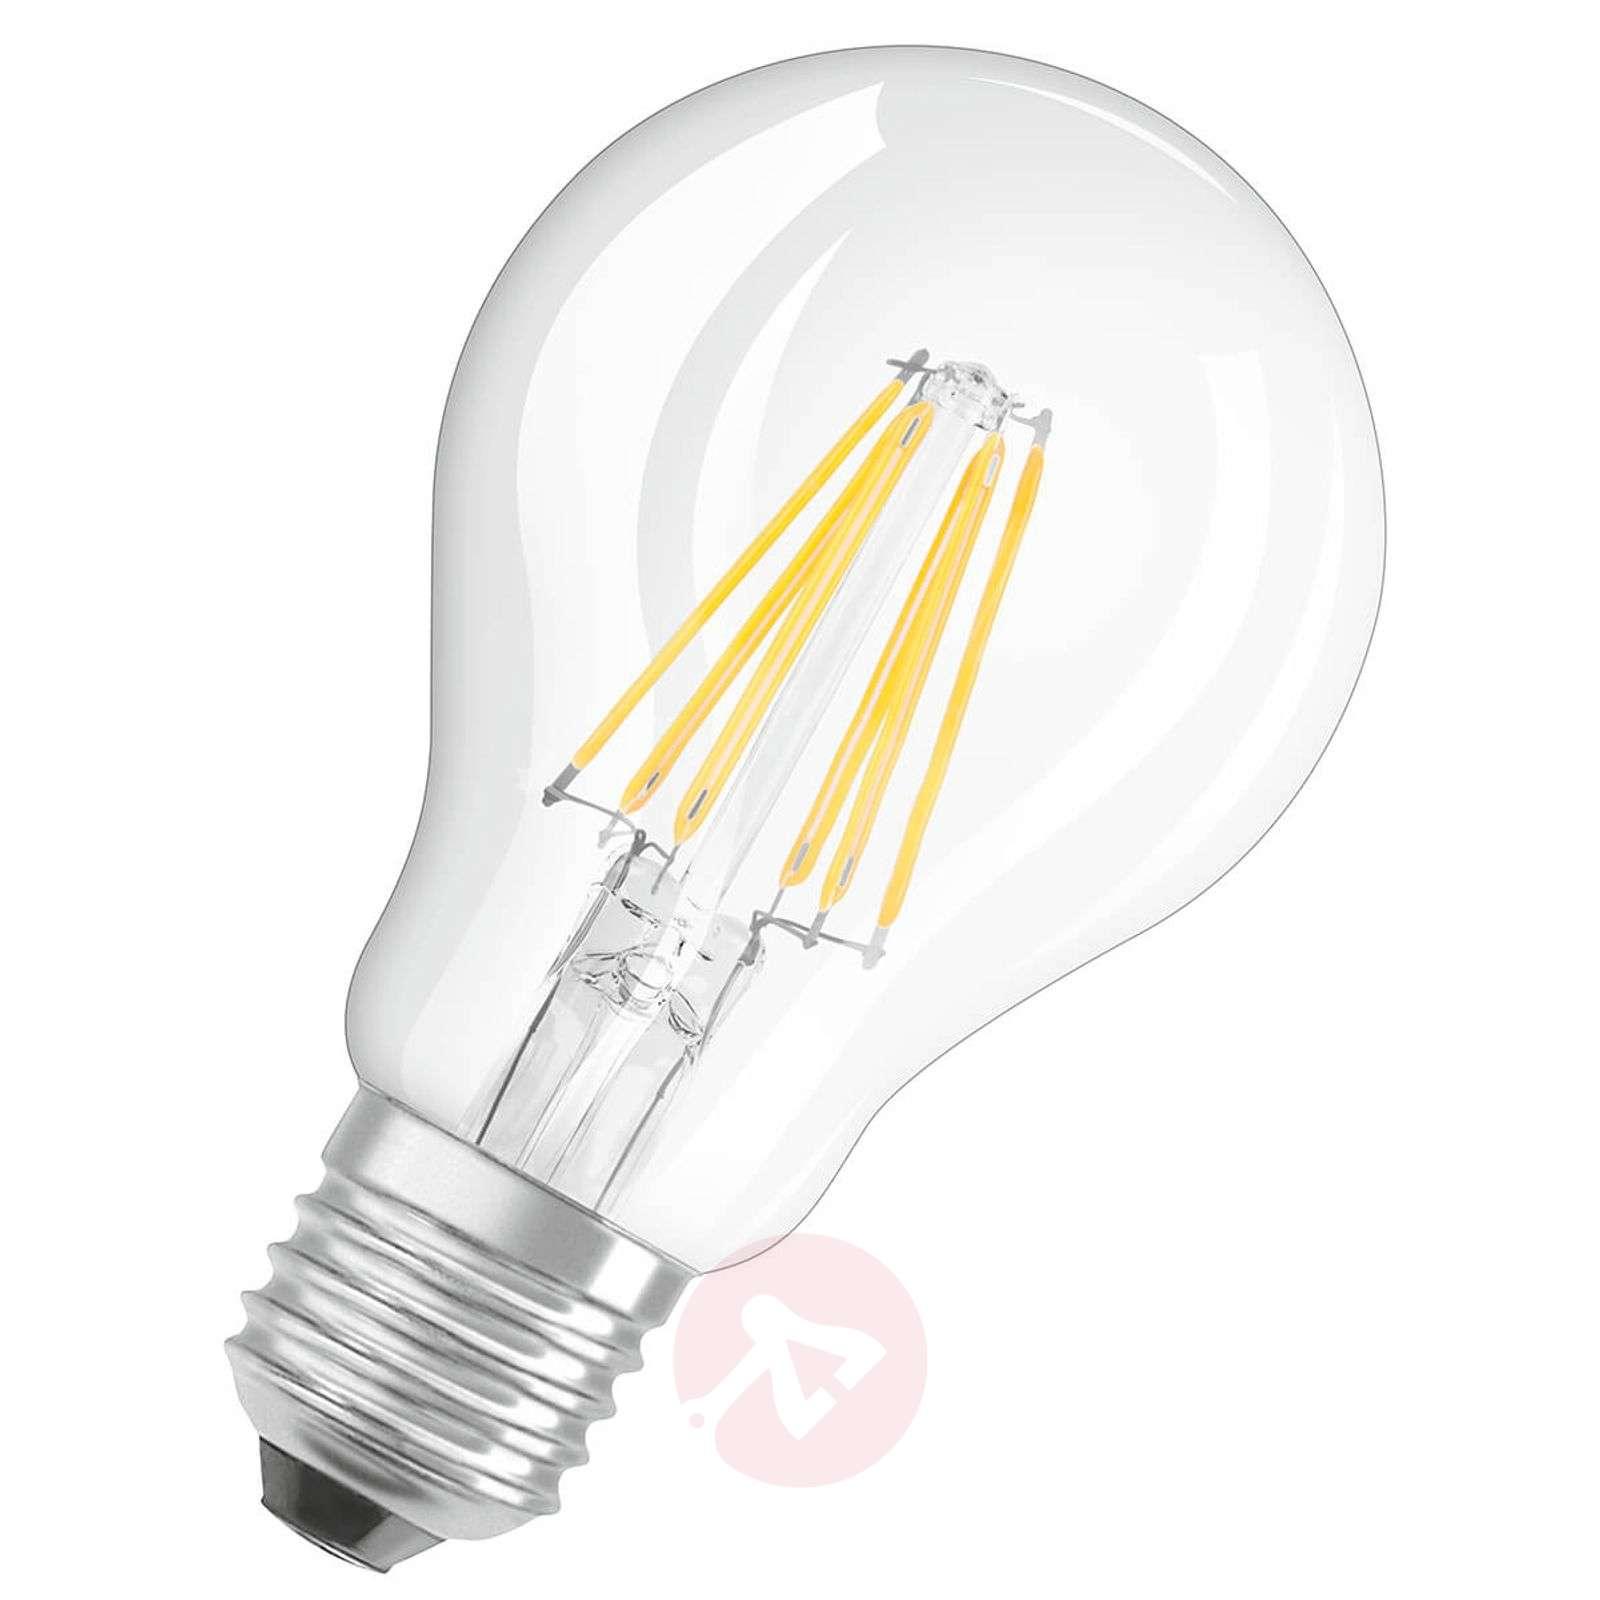 LED-lamppu E27 7W, lämmin valk., Glow Dim-tehoste-7262078-01